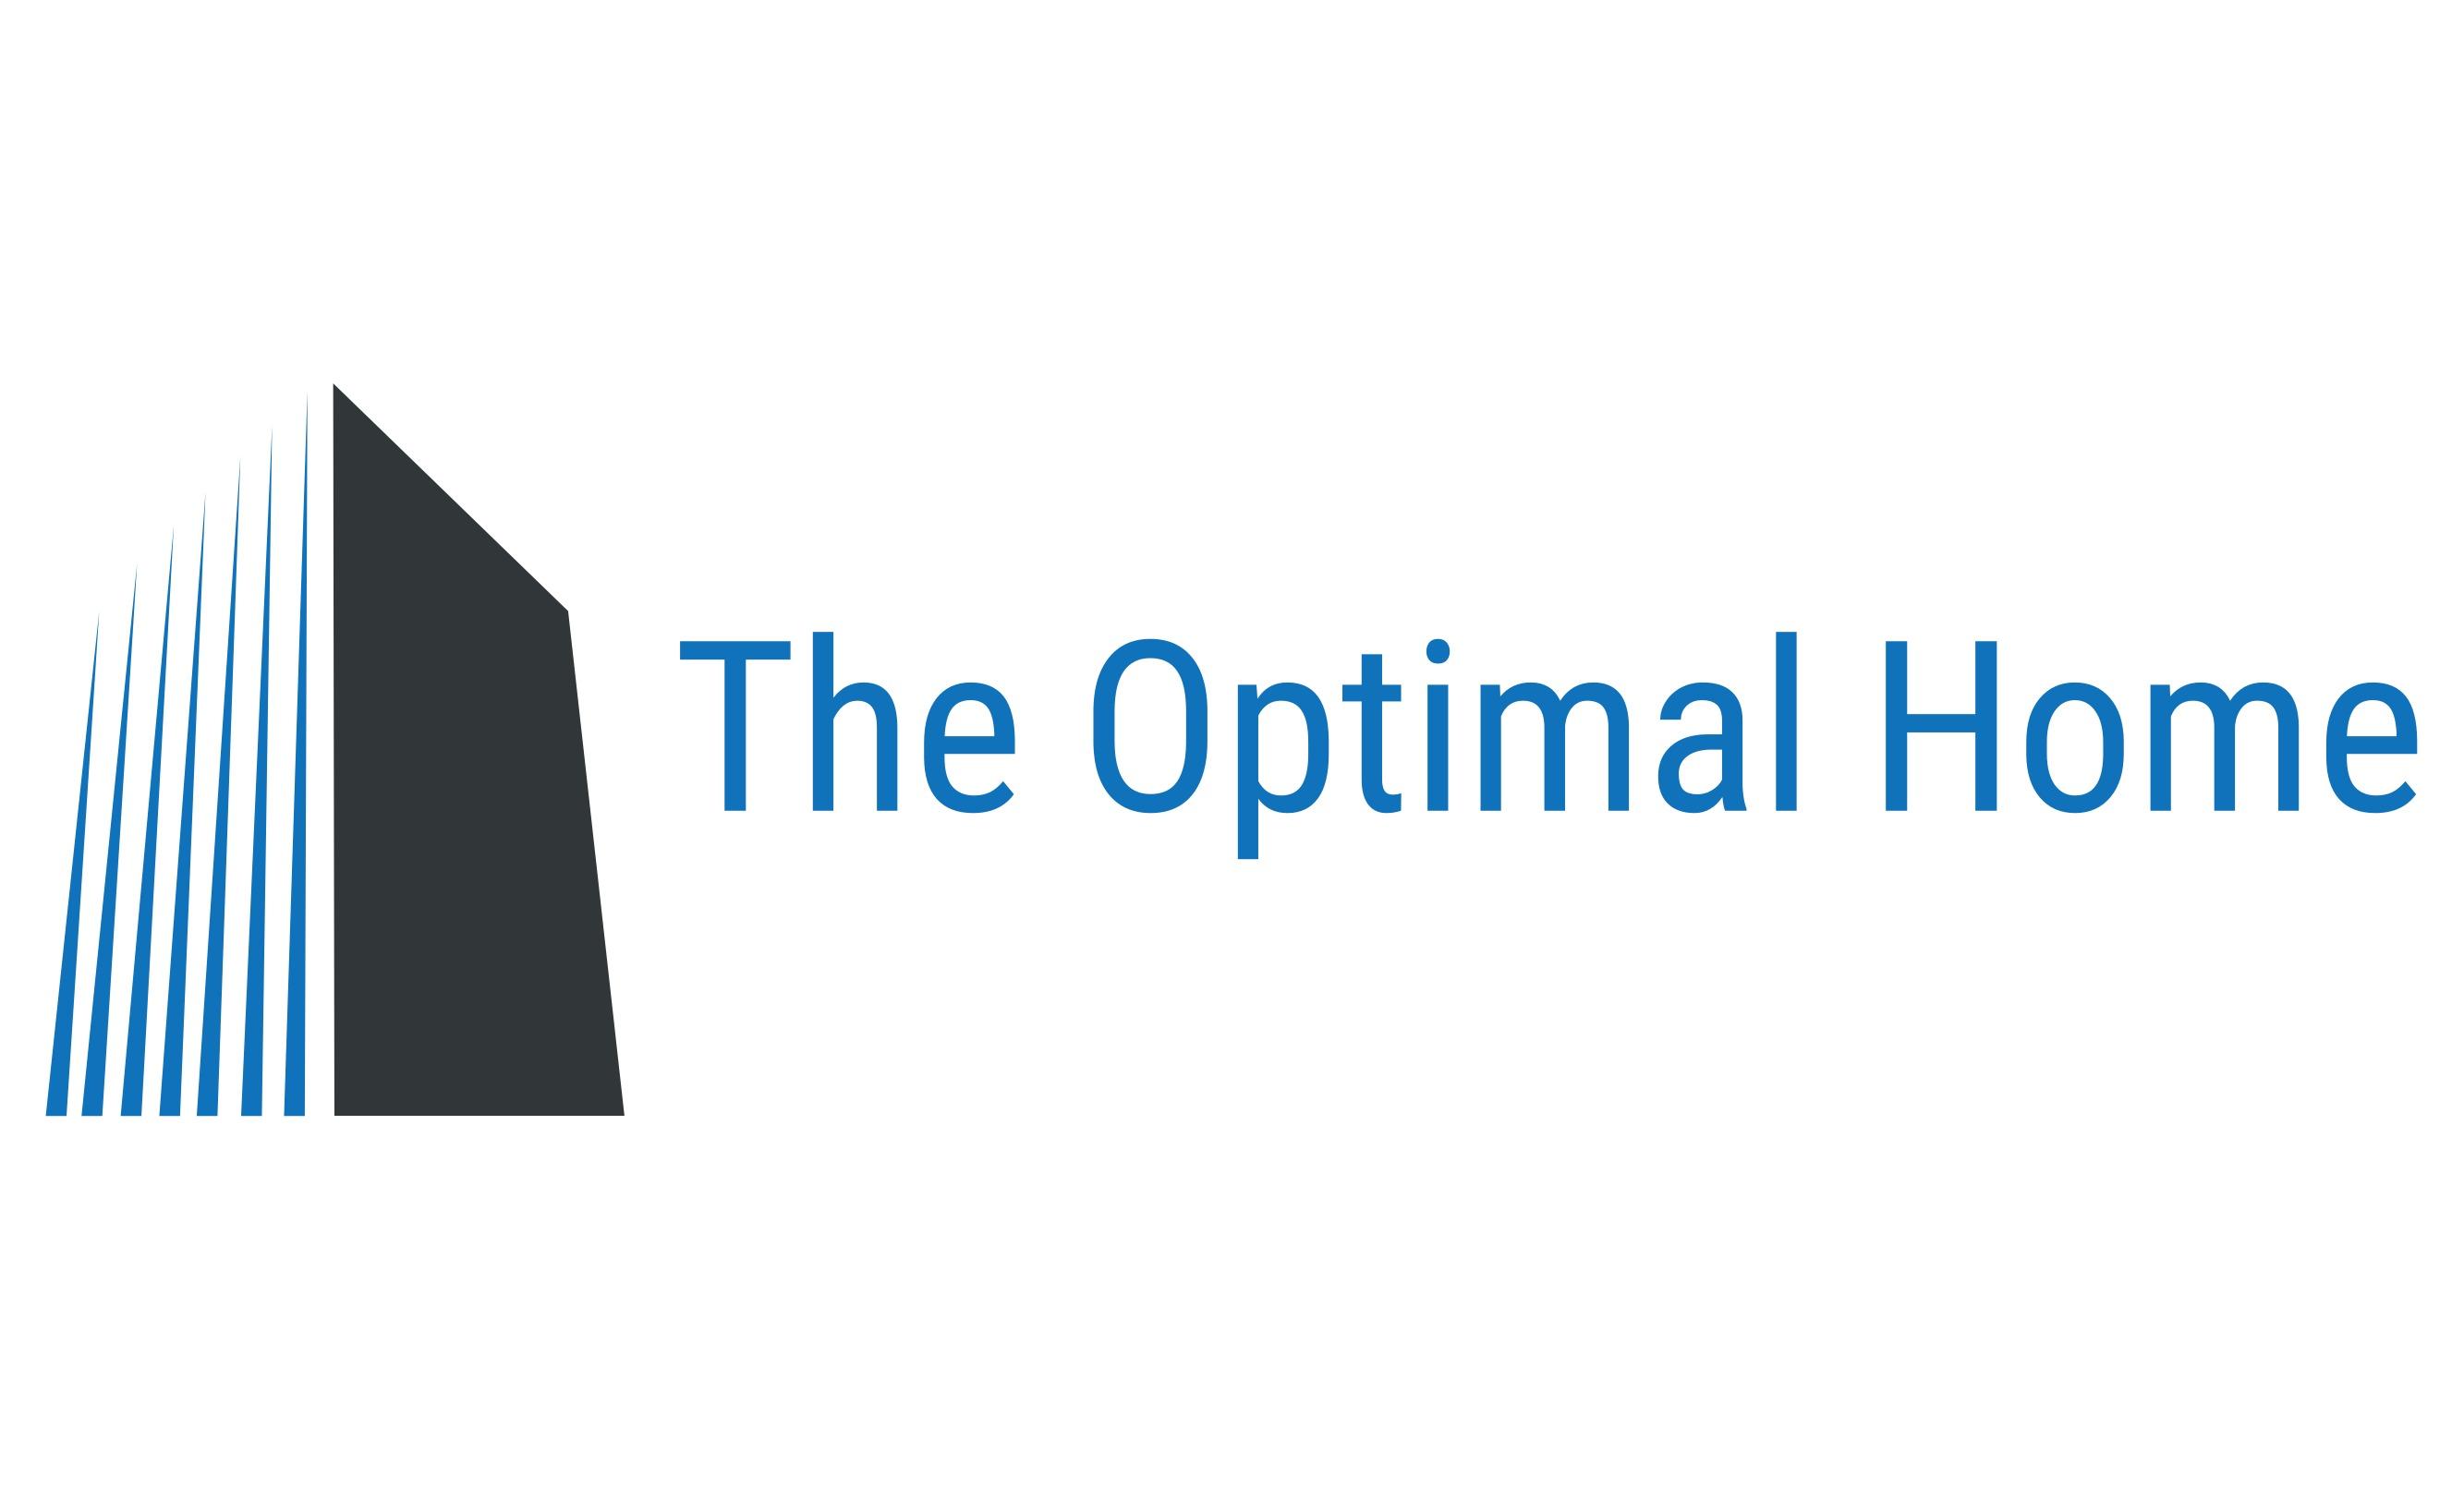 The Optimal Home